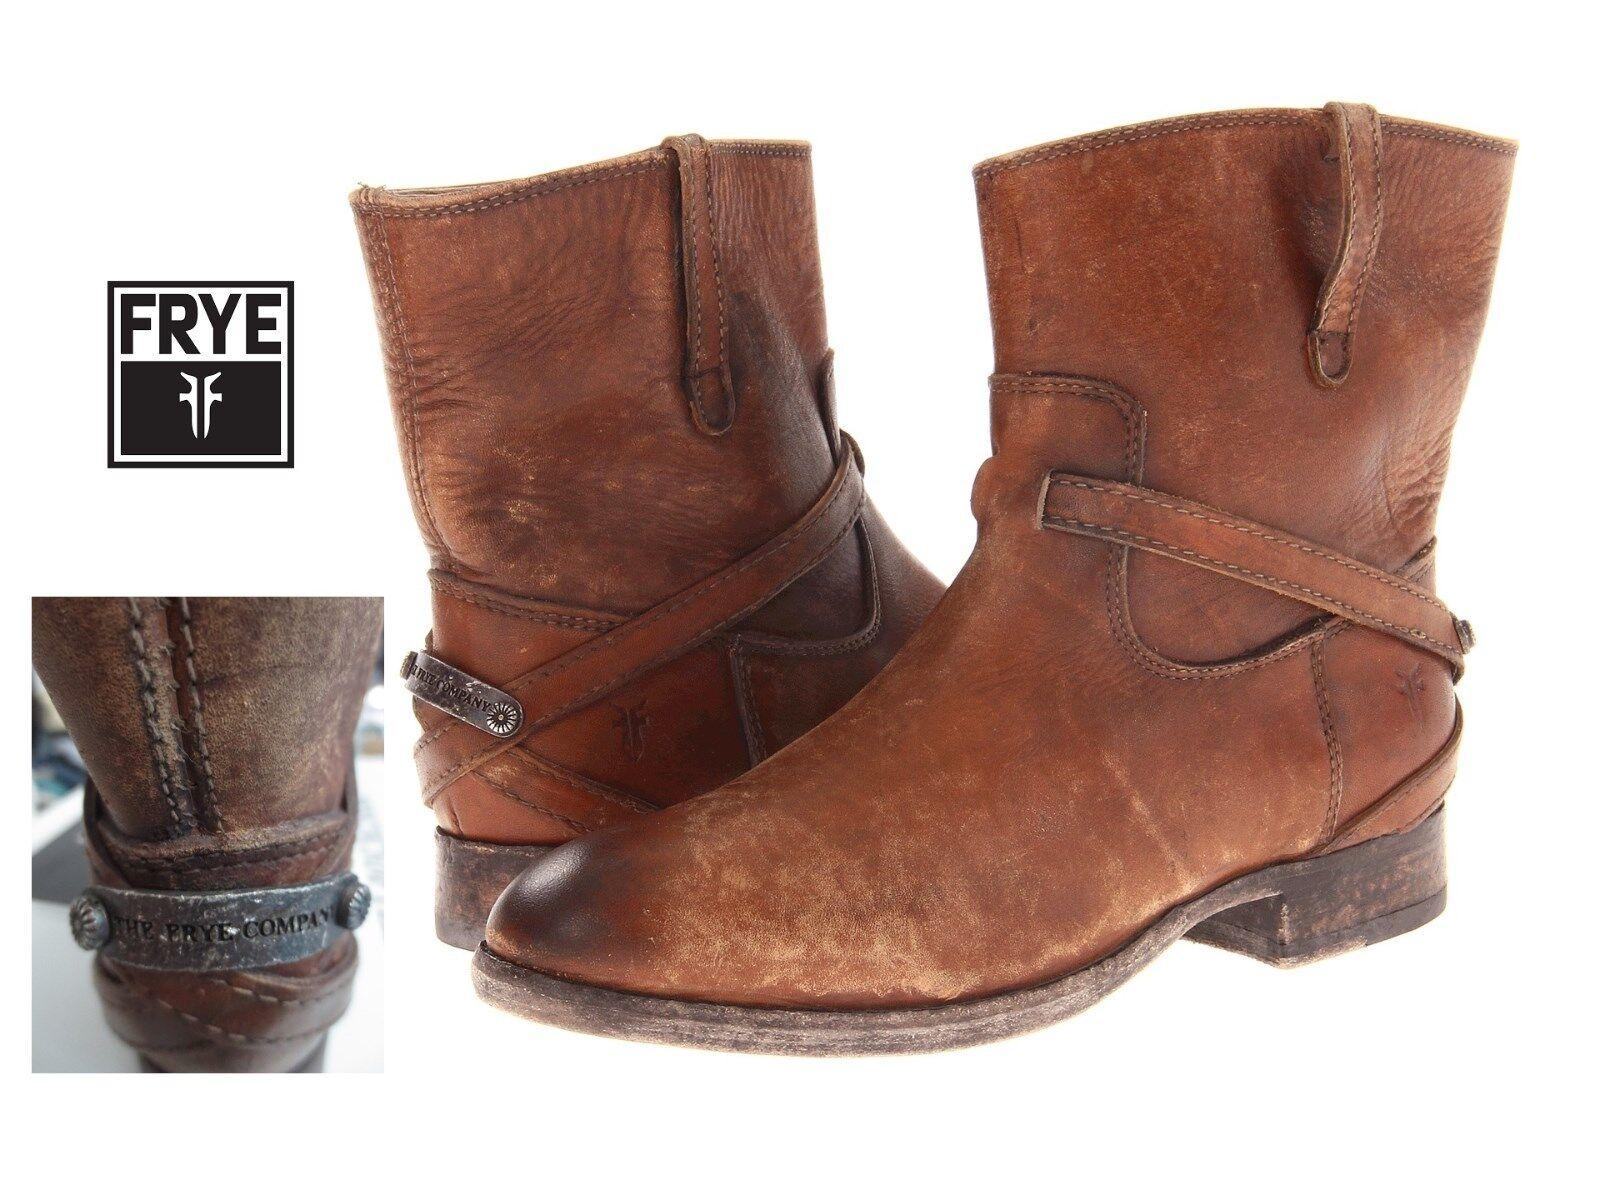 Frye Women's 6.5 med Cognac Brown Lindsay Plate Short leather boots, NIB